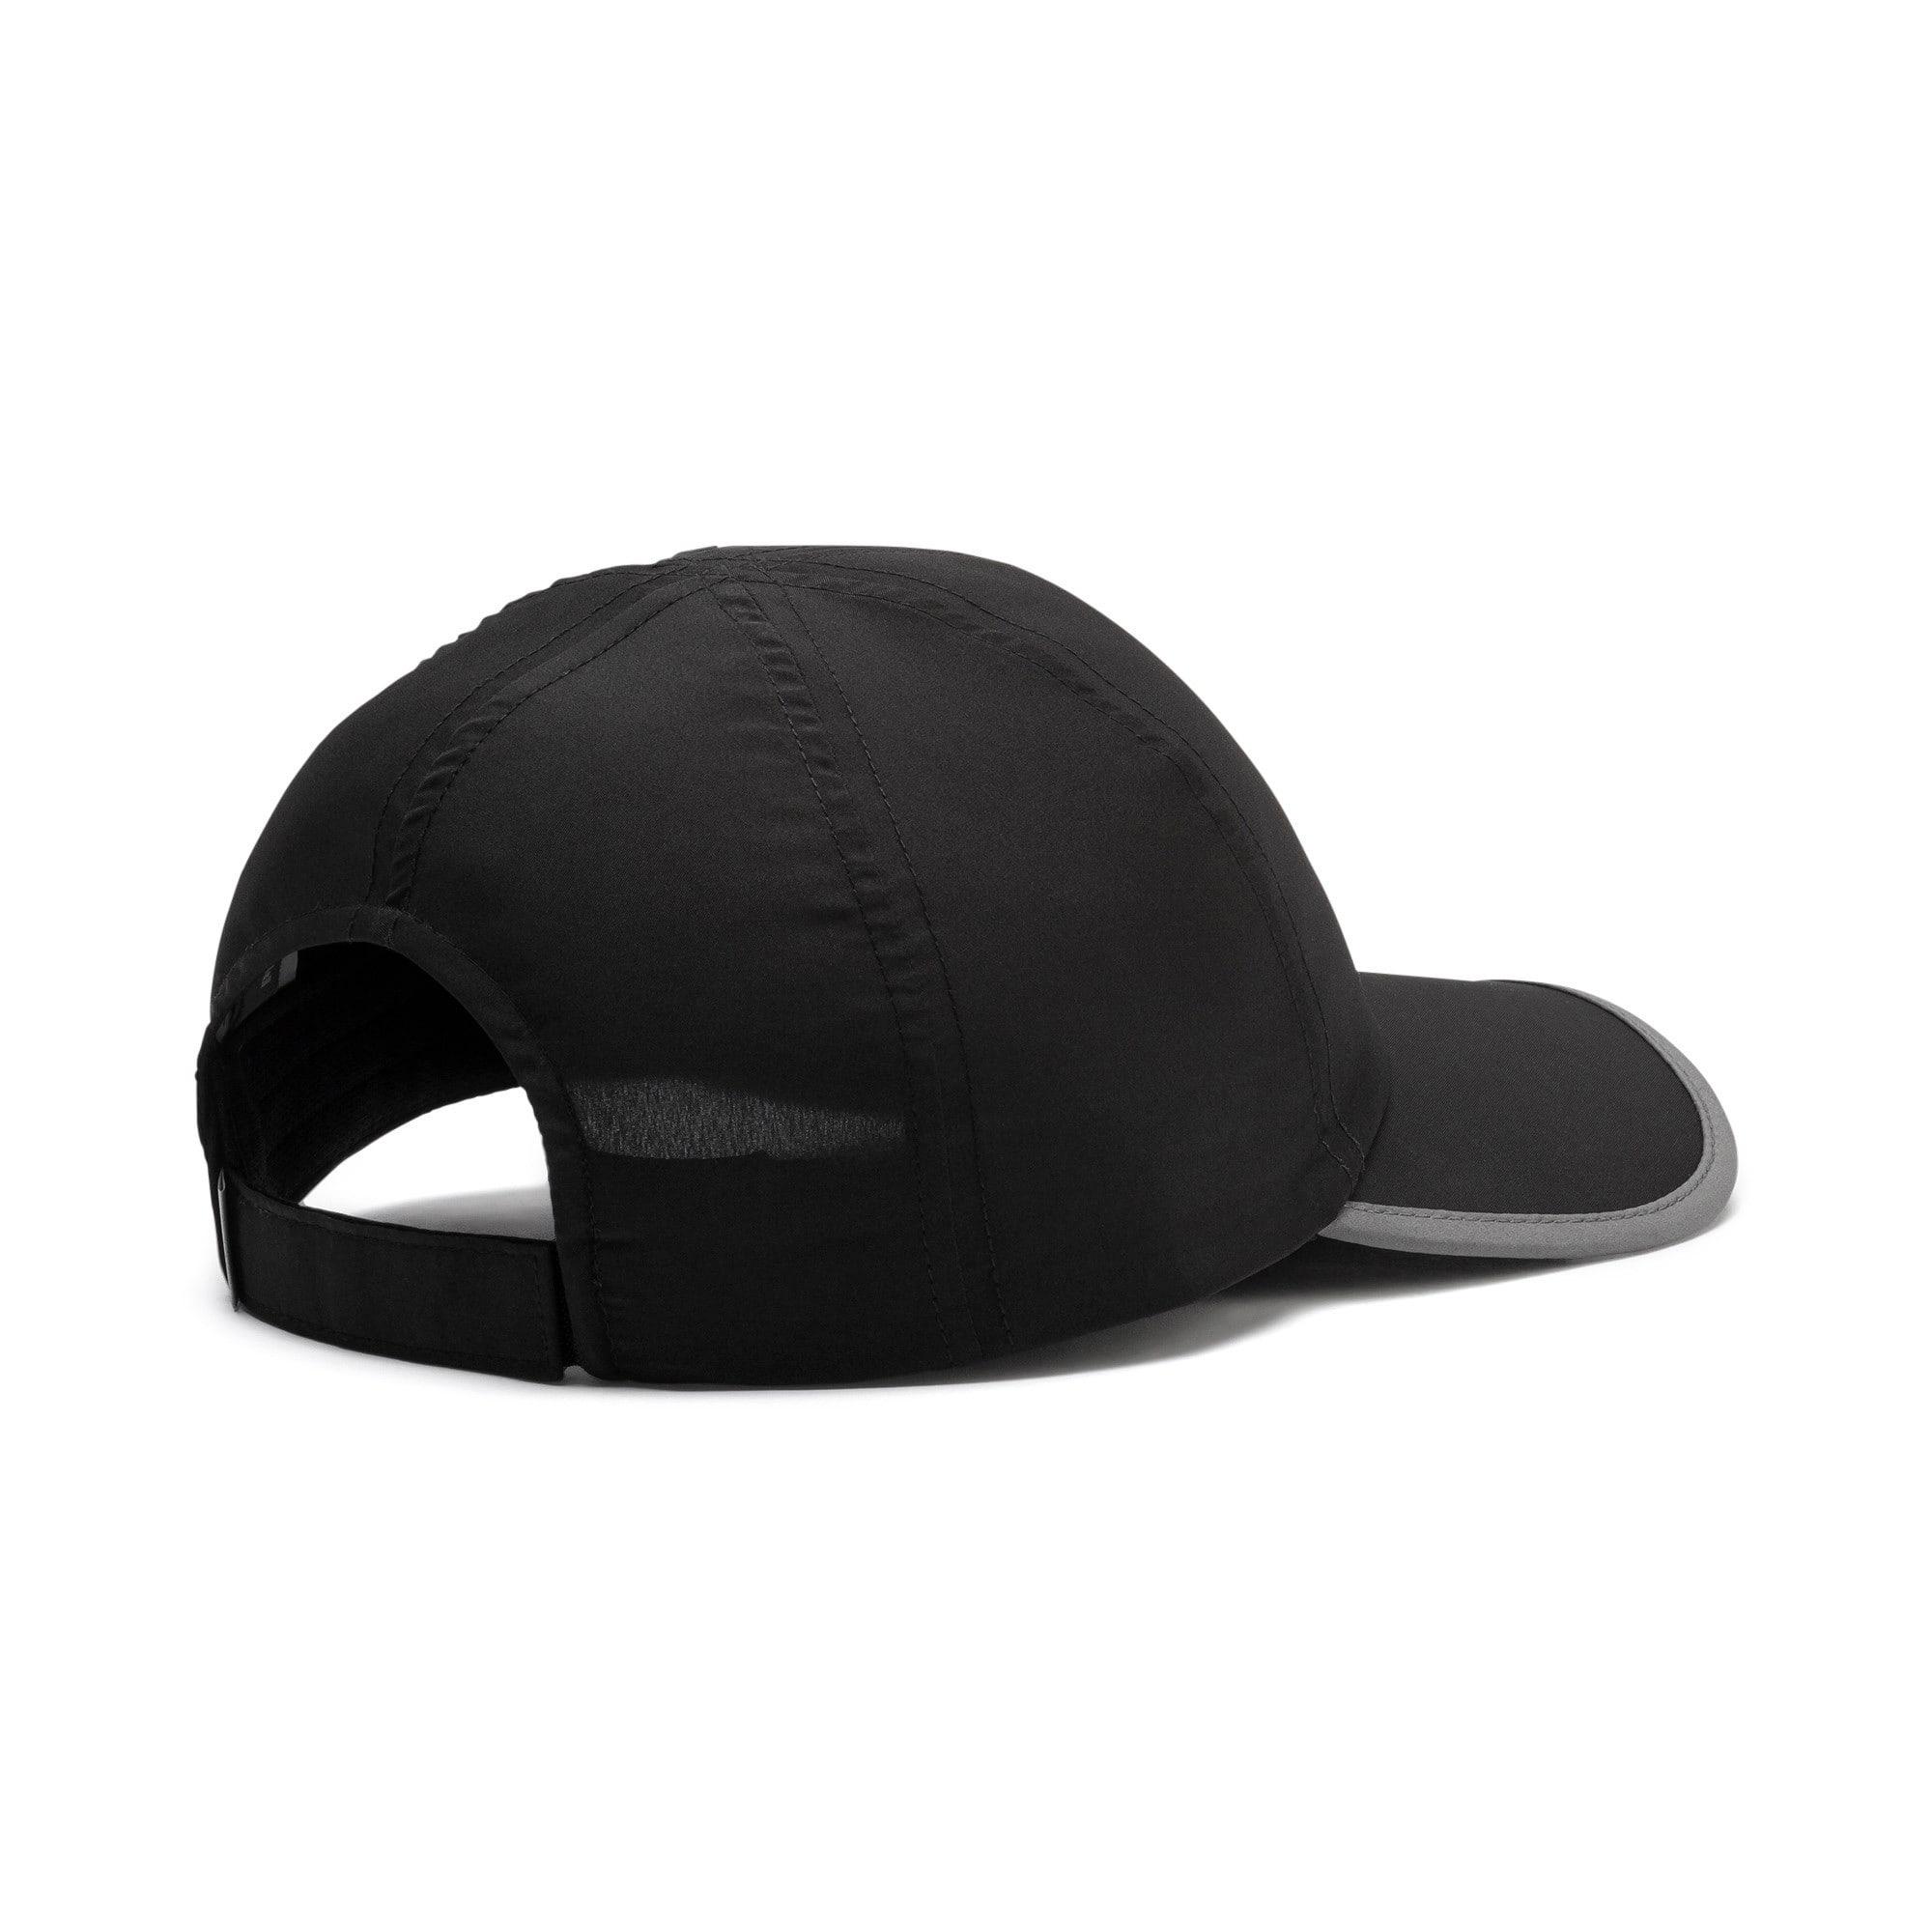 Thumbnail 3 of ESS Running Cap, Puma Black-No. 1, medium